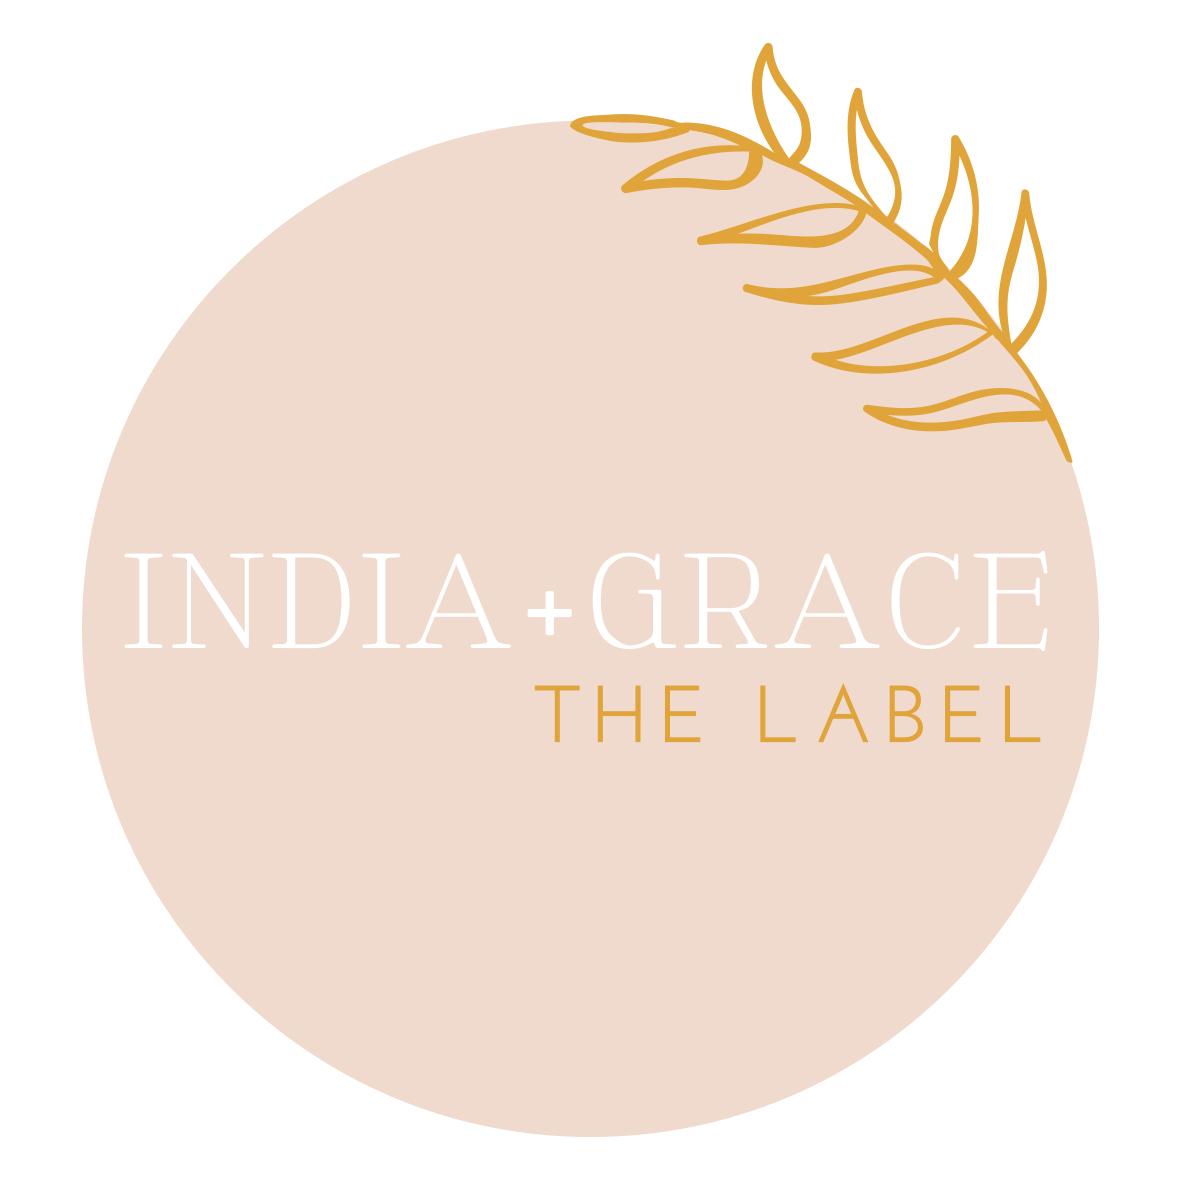 India + Grace